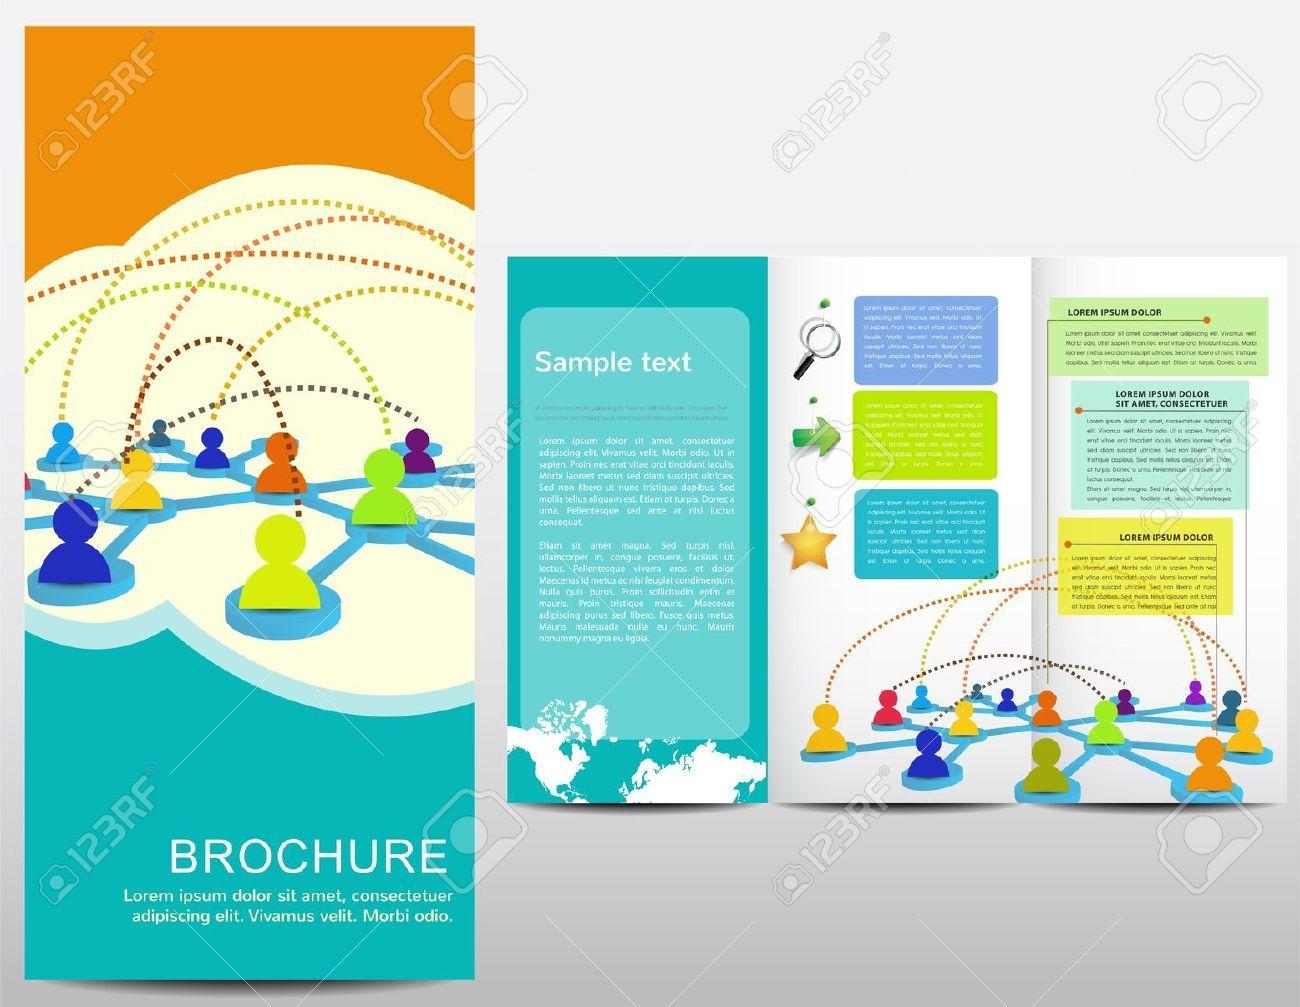 Awesome Marketing Brochure Templates Set Marketing Strategies - Marketing brochures templates